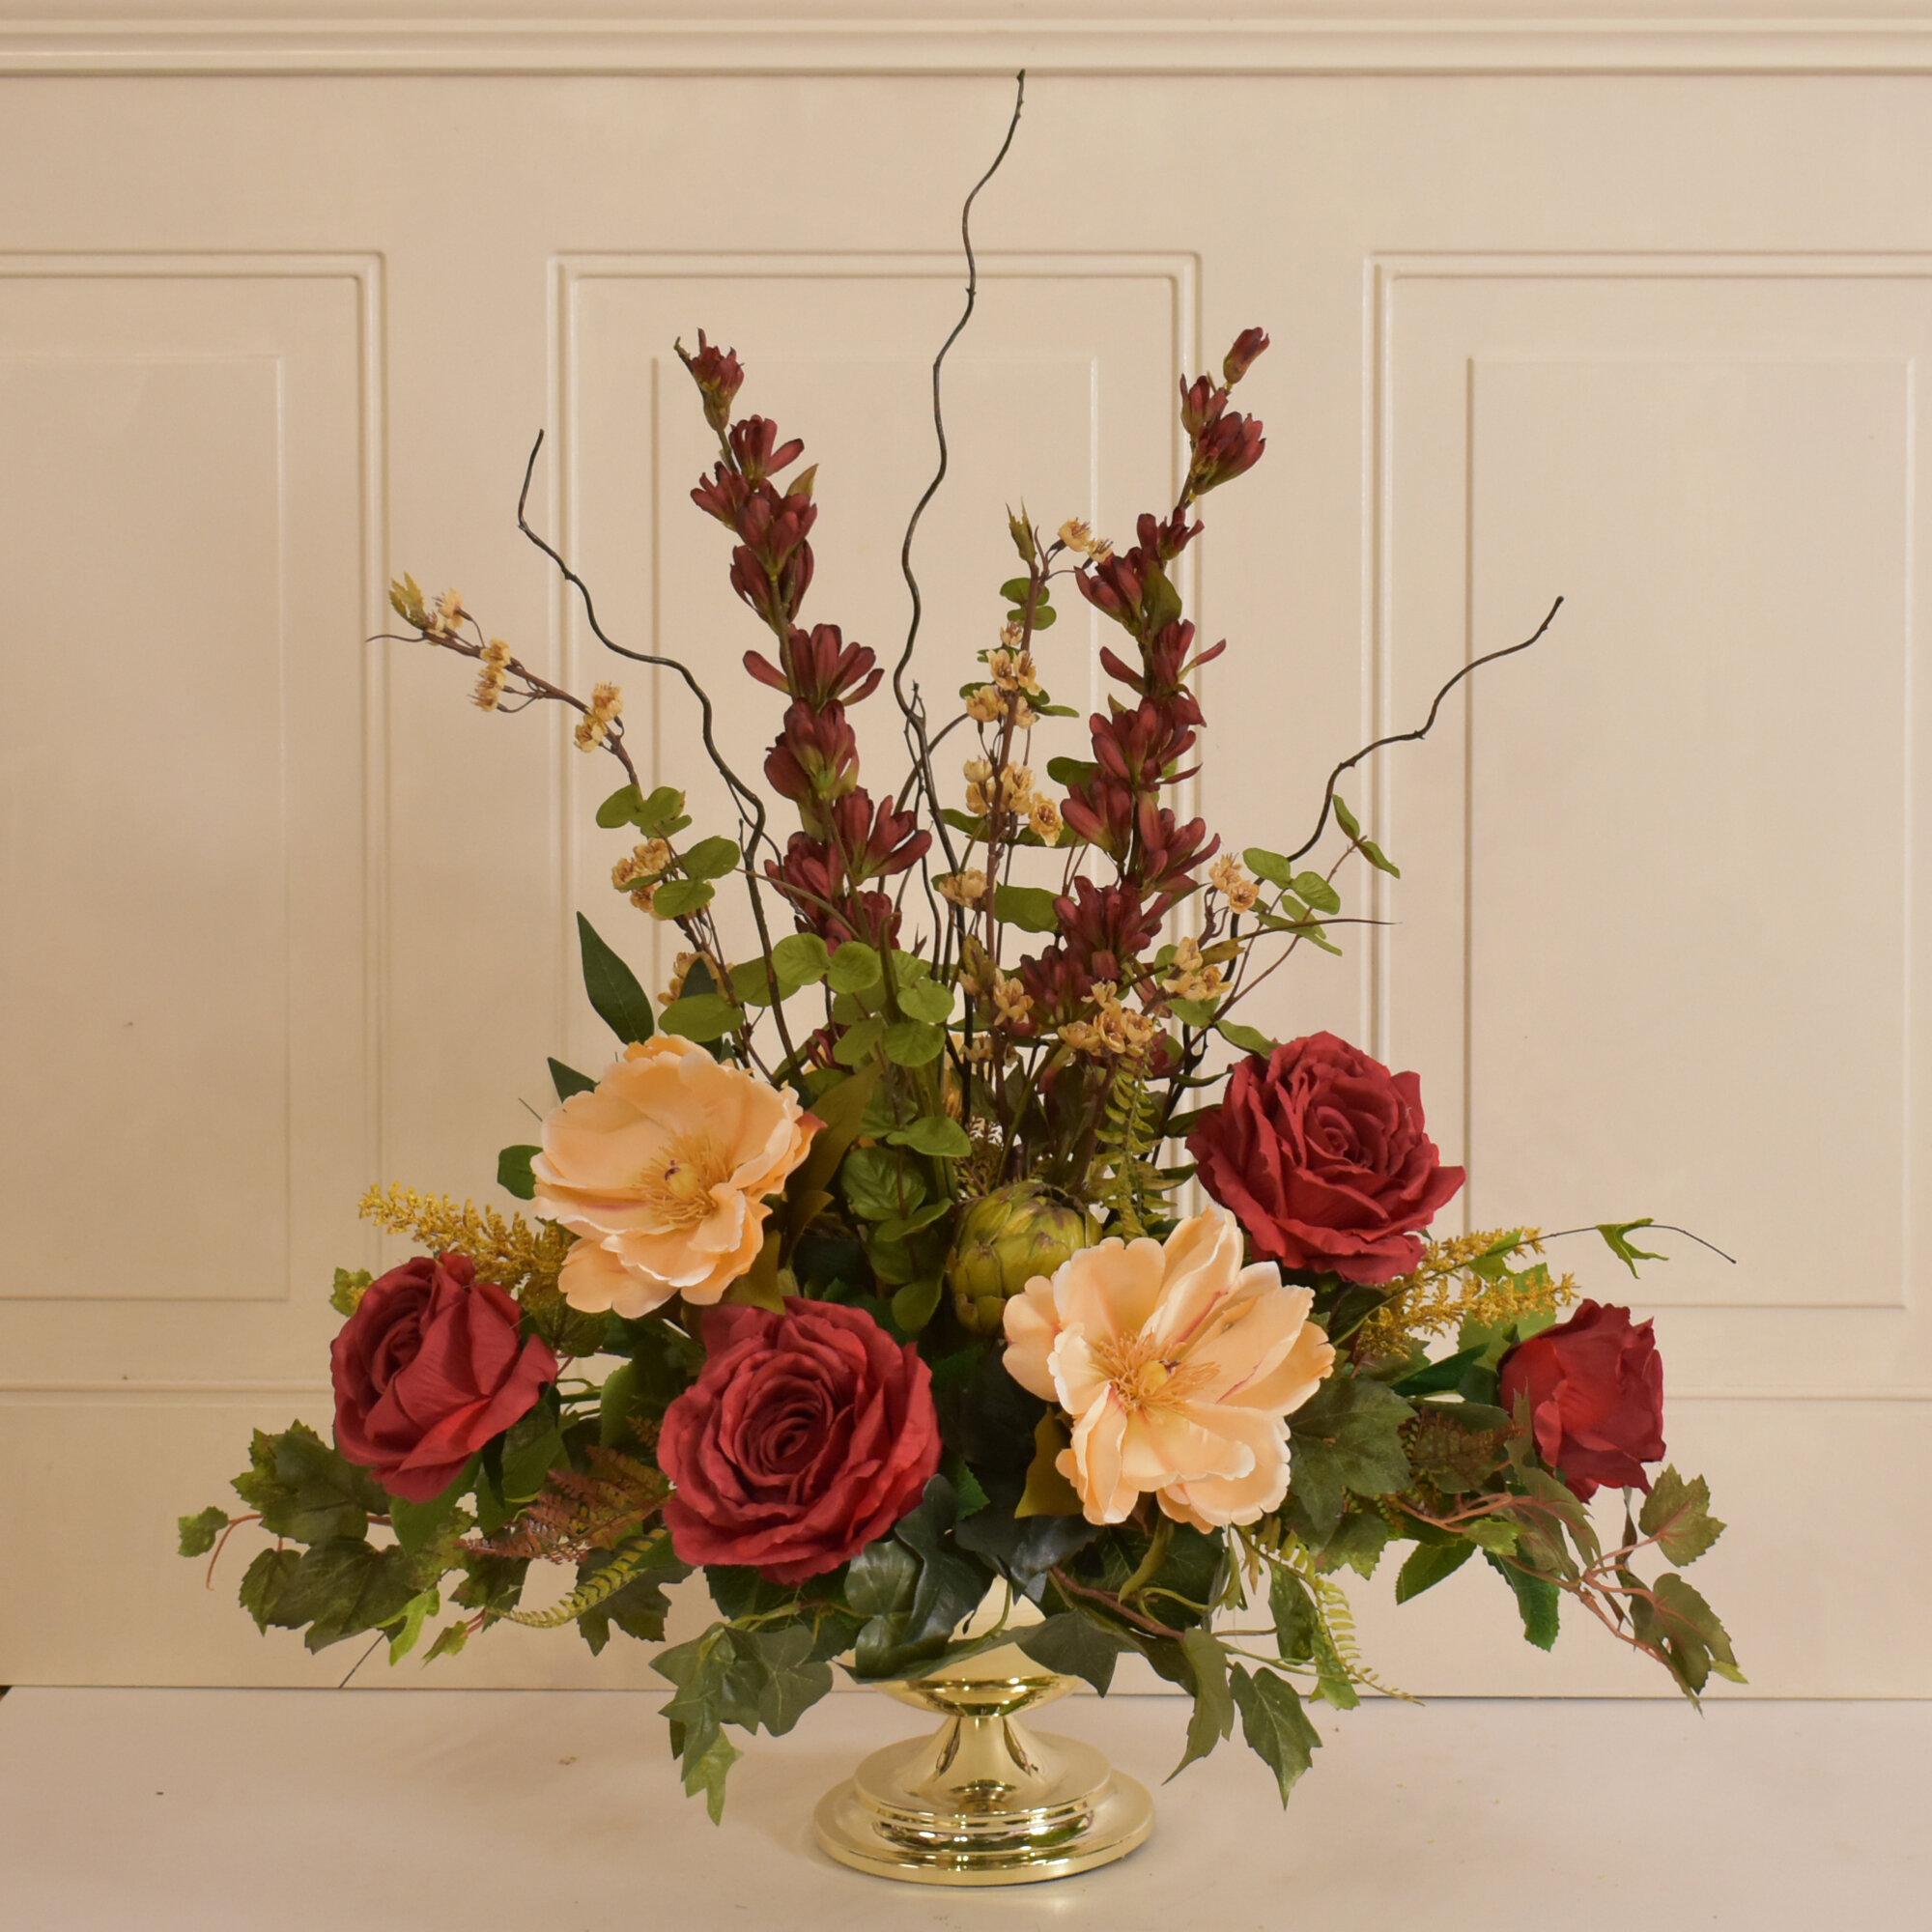 canora grey silk centerpiece flower floral arrangement wayfair rh wayfair com centerpiece floral arrangement ideas centerpiece floral arrangements for weddings